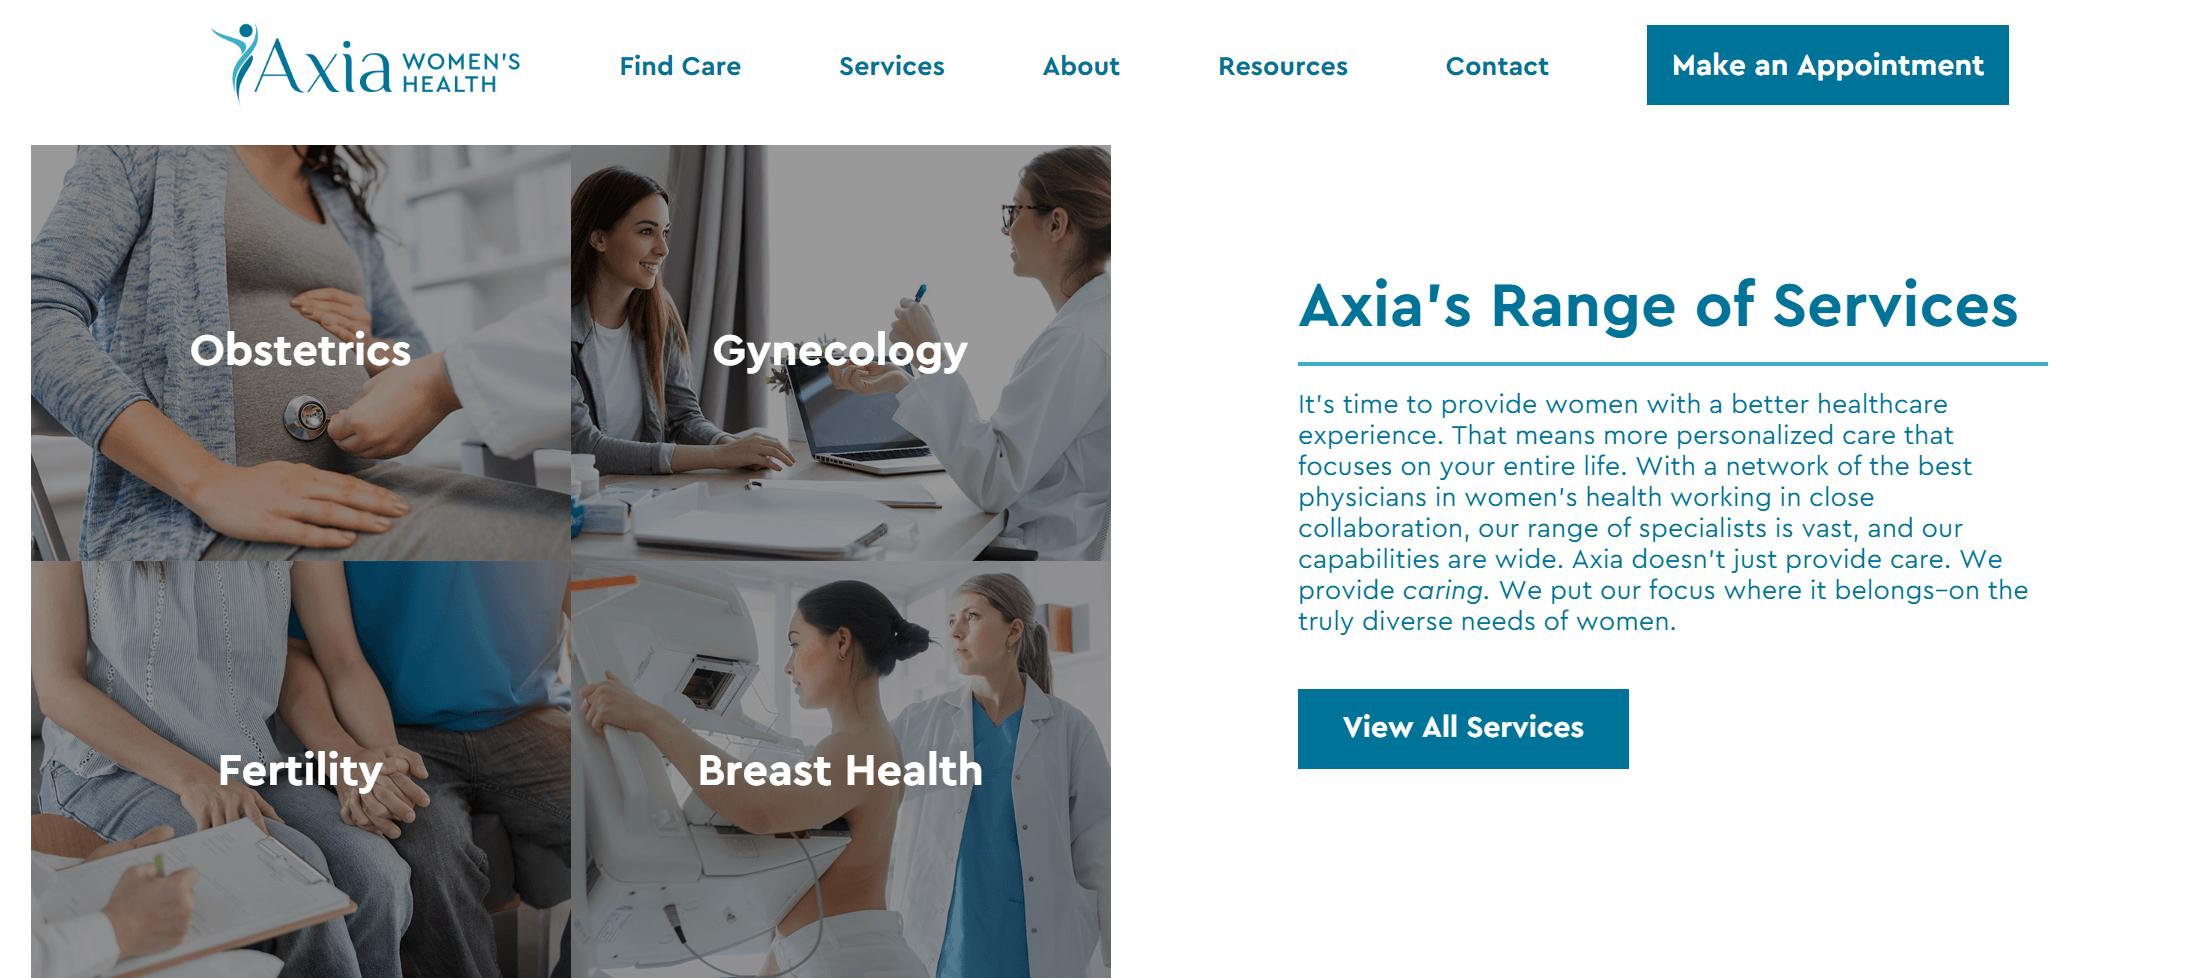 Prenatal App Babyscripts Announces Partnership with Axia Women's Health